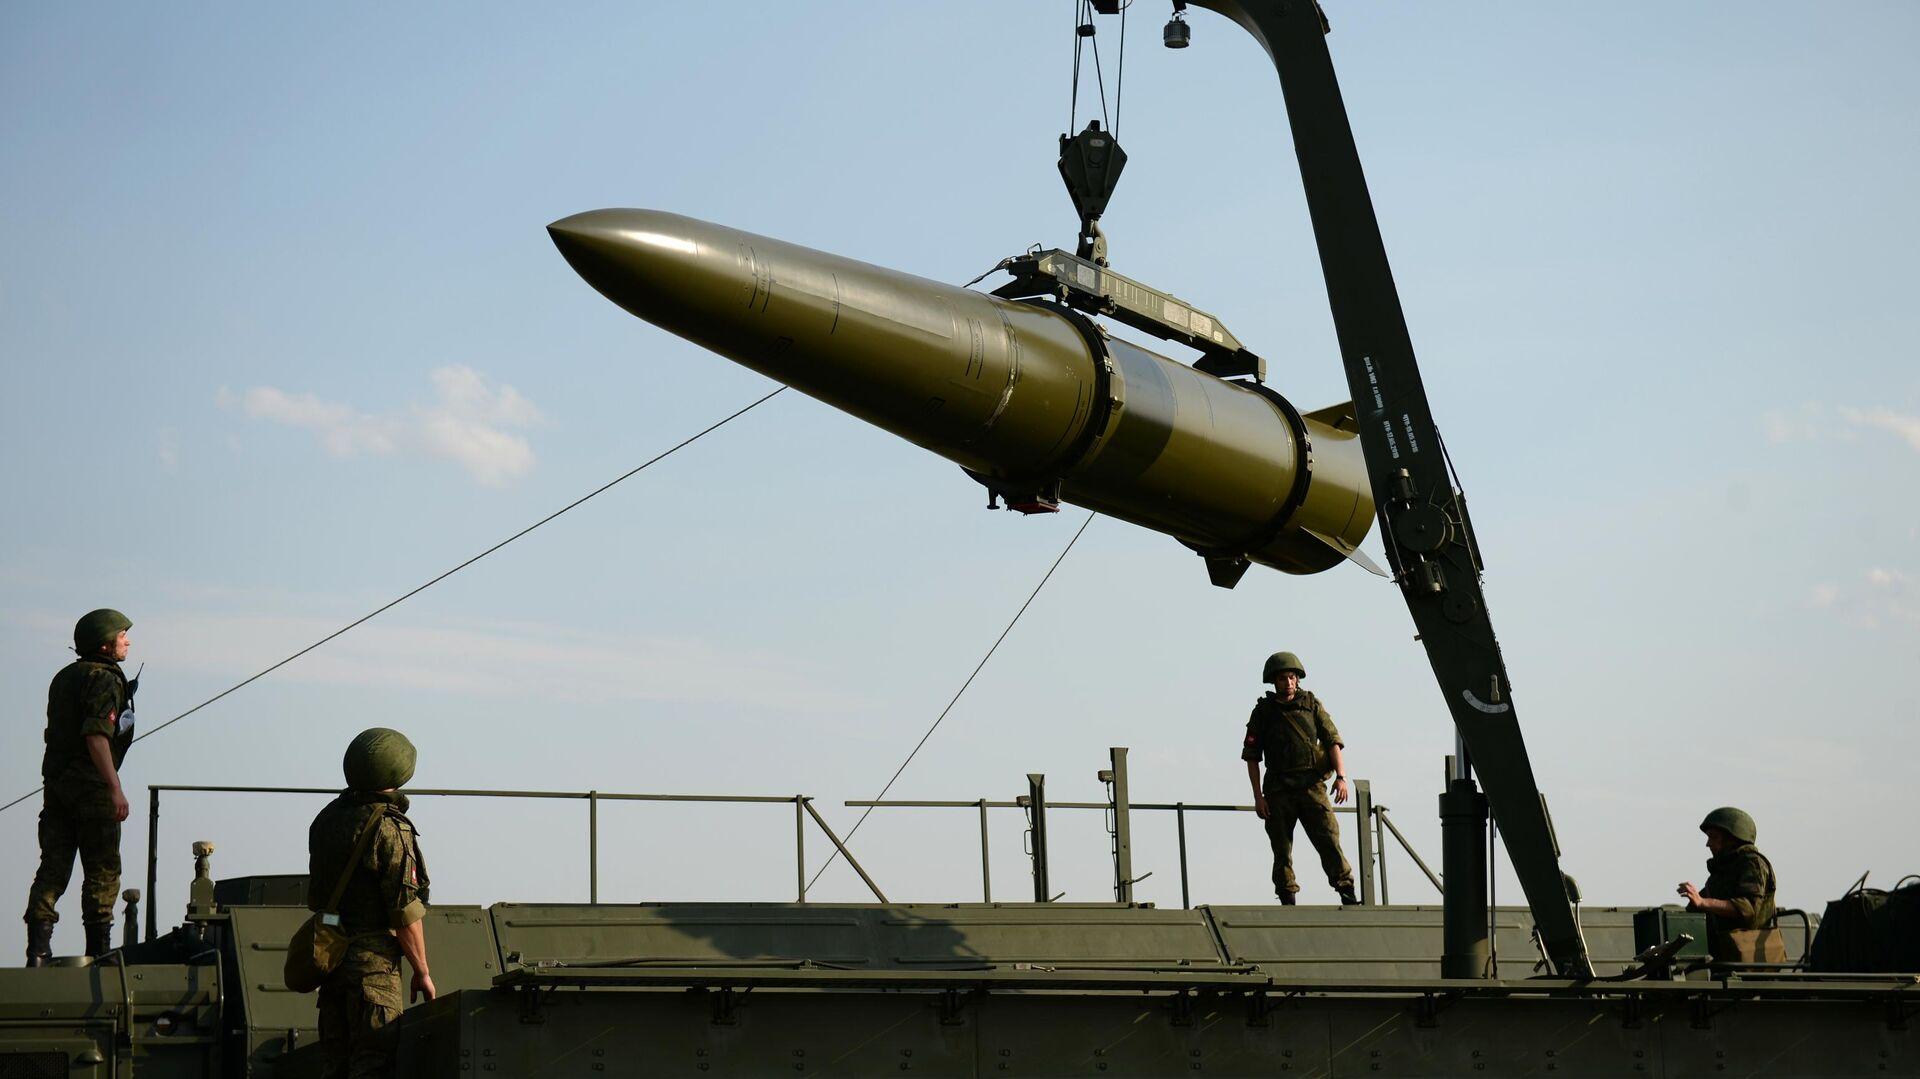 Развёртывание оперативно-тактического ракетного комплекса Искандер-М - РИА Новости, 1920, 14.10.2020